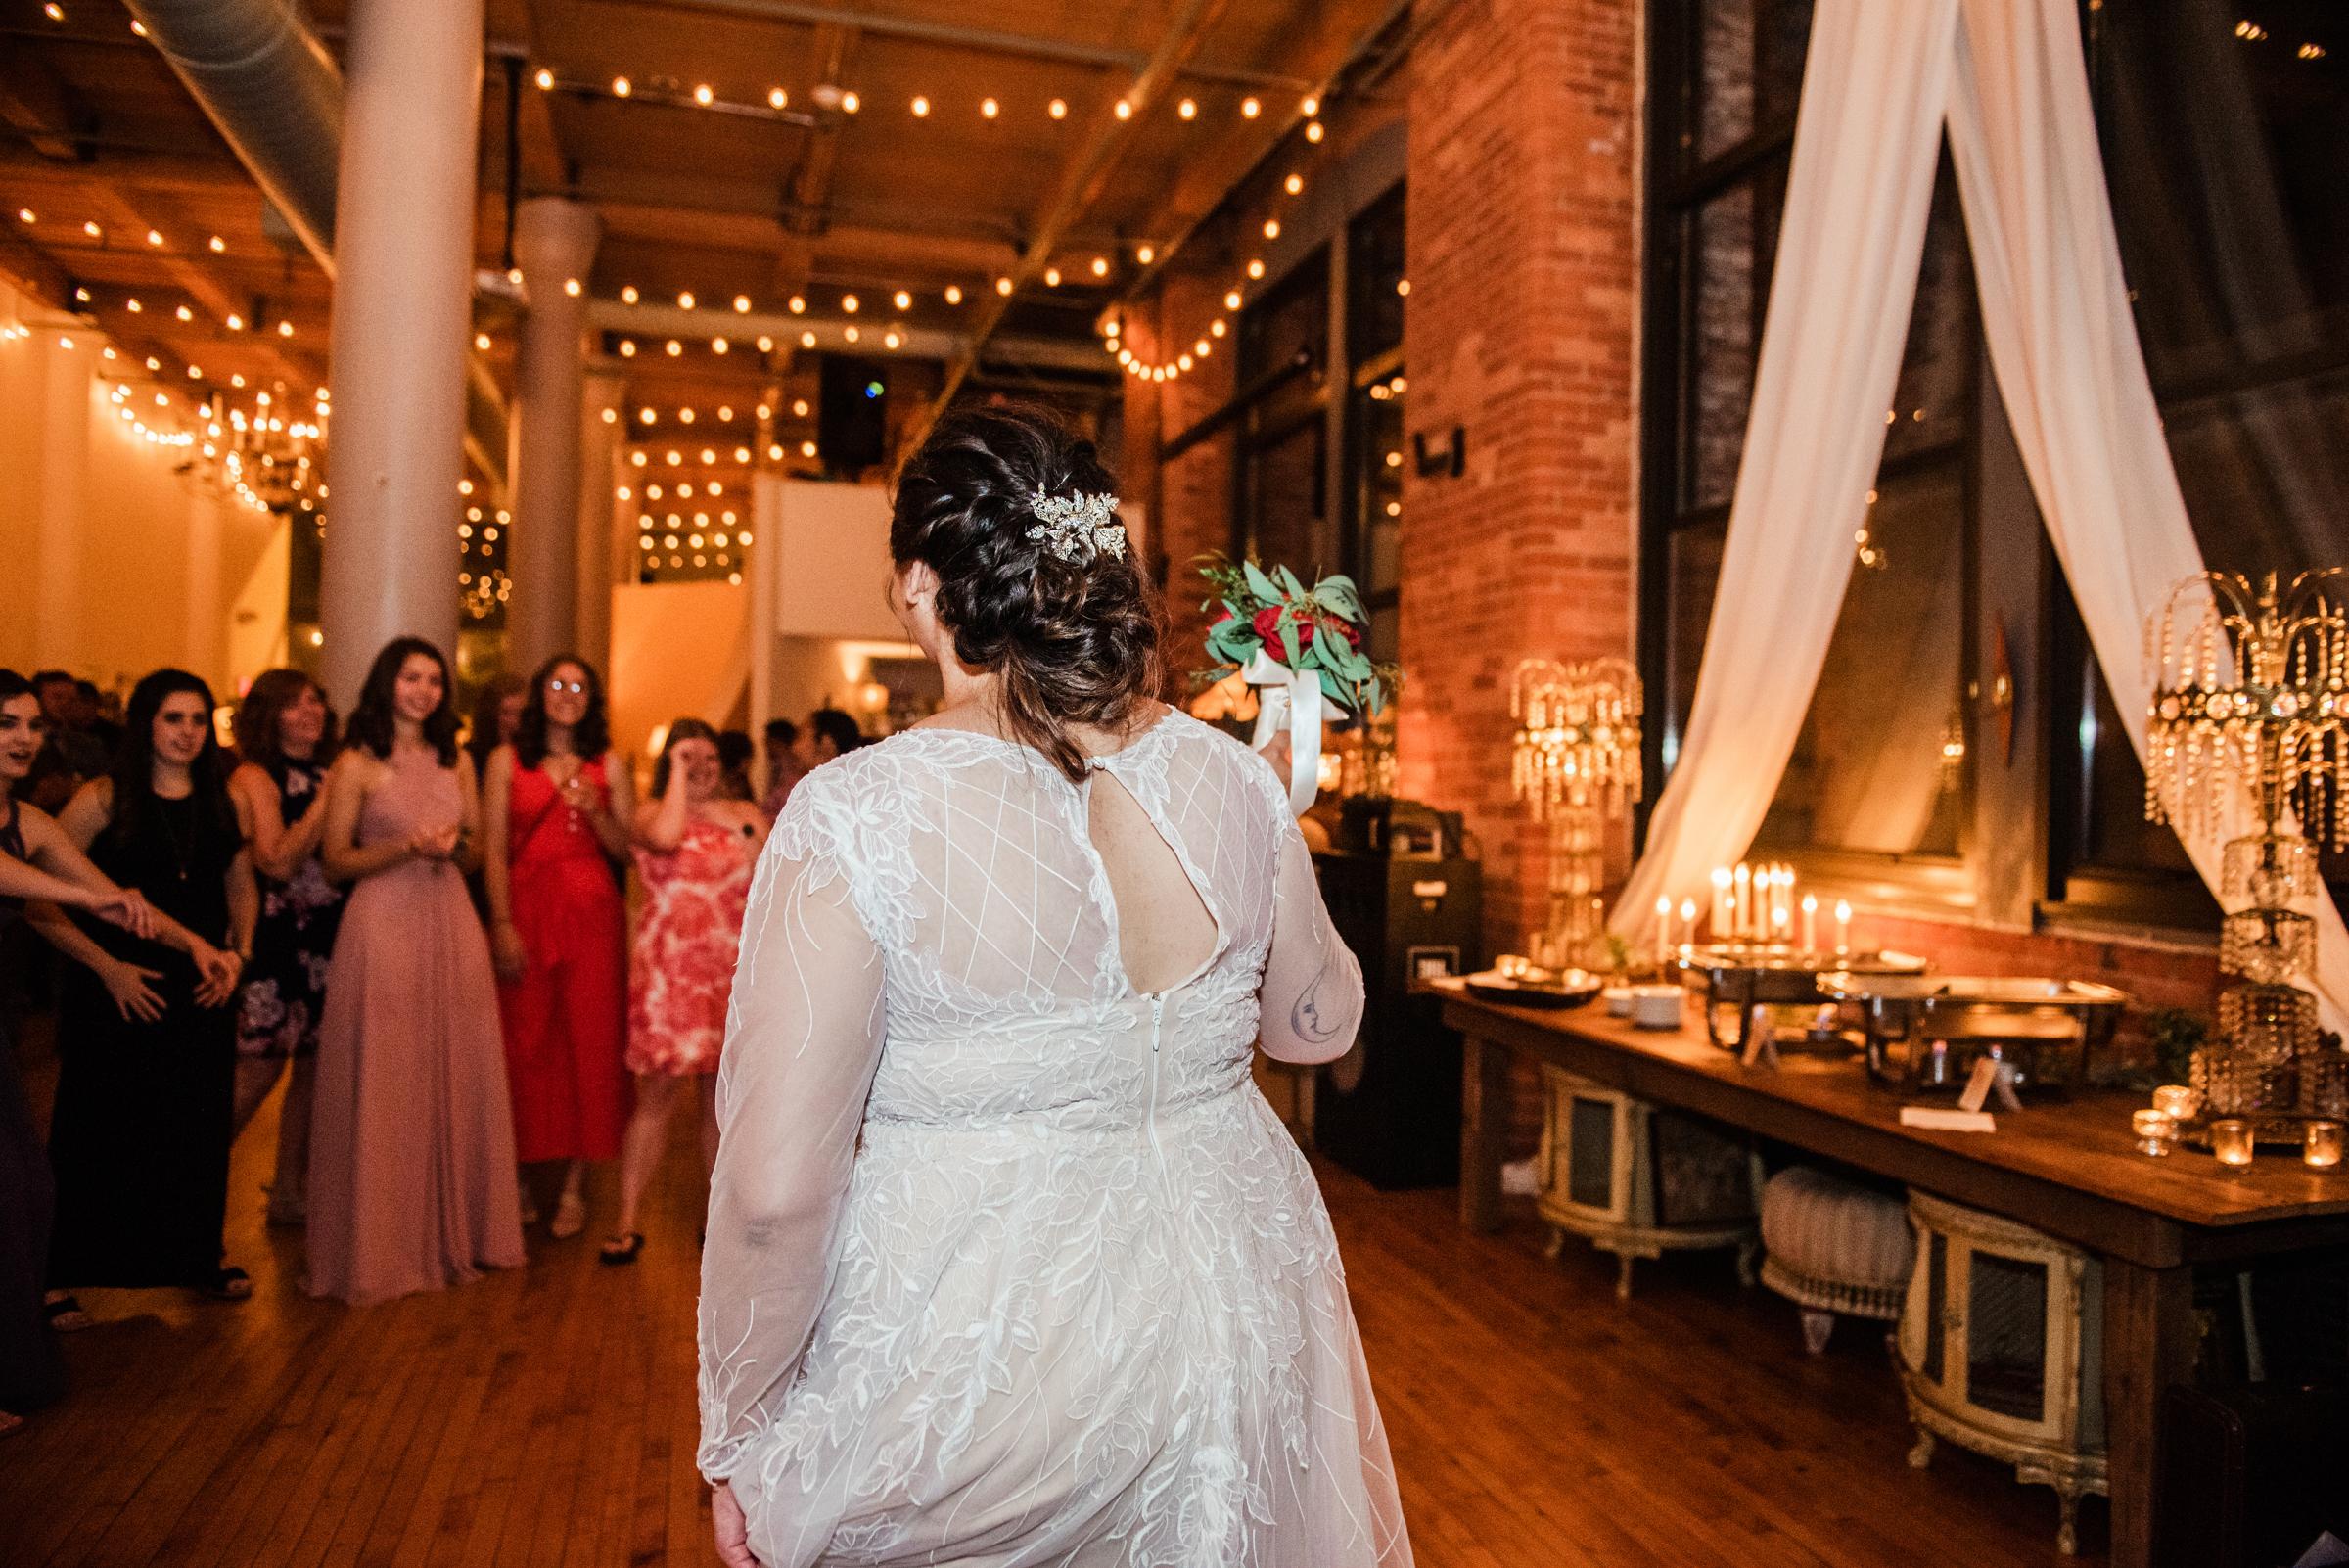 Studio_180_Lamberton_Conservatory_Rochester_Wedding_JILL_STUDIO_Rochester_NY_Photographer_DSC_9322.jpg